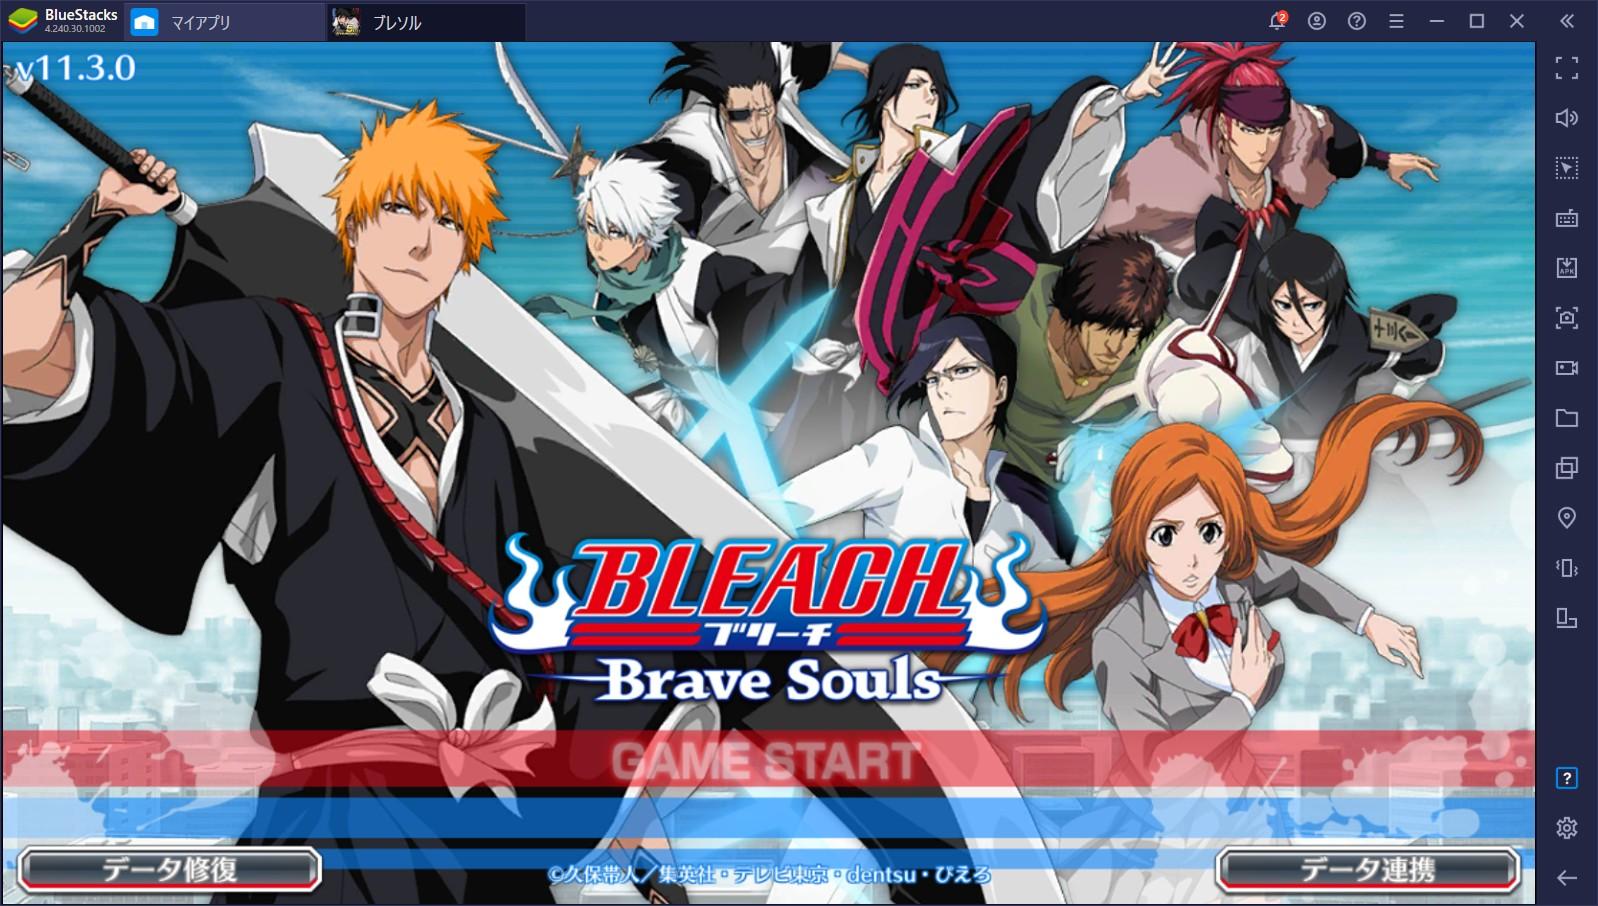 BlueStacks:『BLEACH Brave Souls』初心者向け攻略ガイド